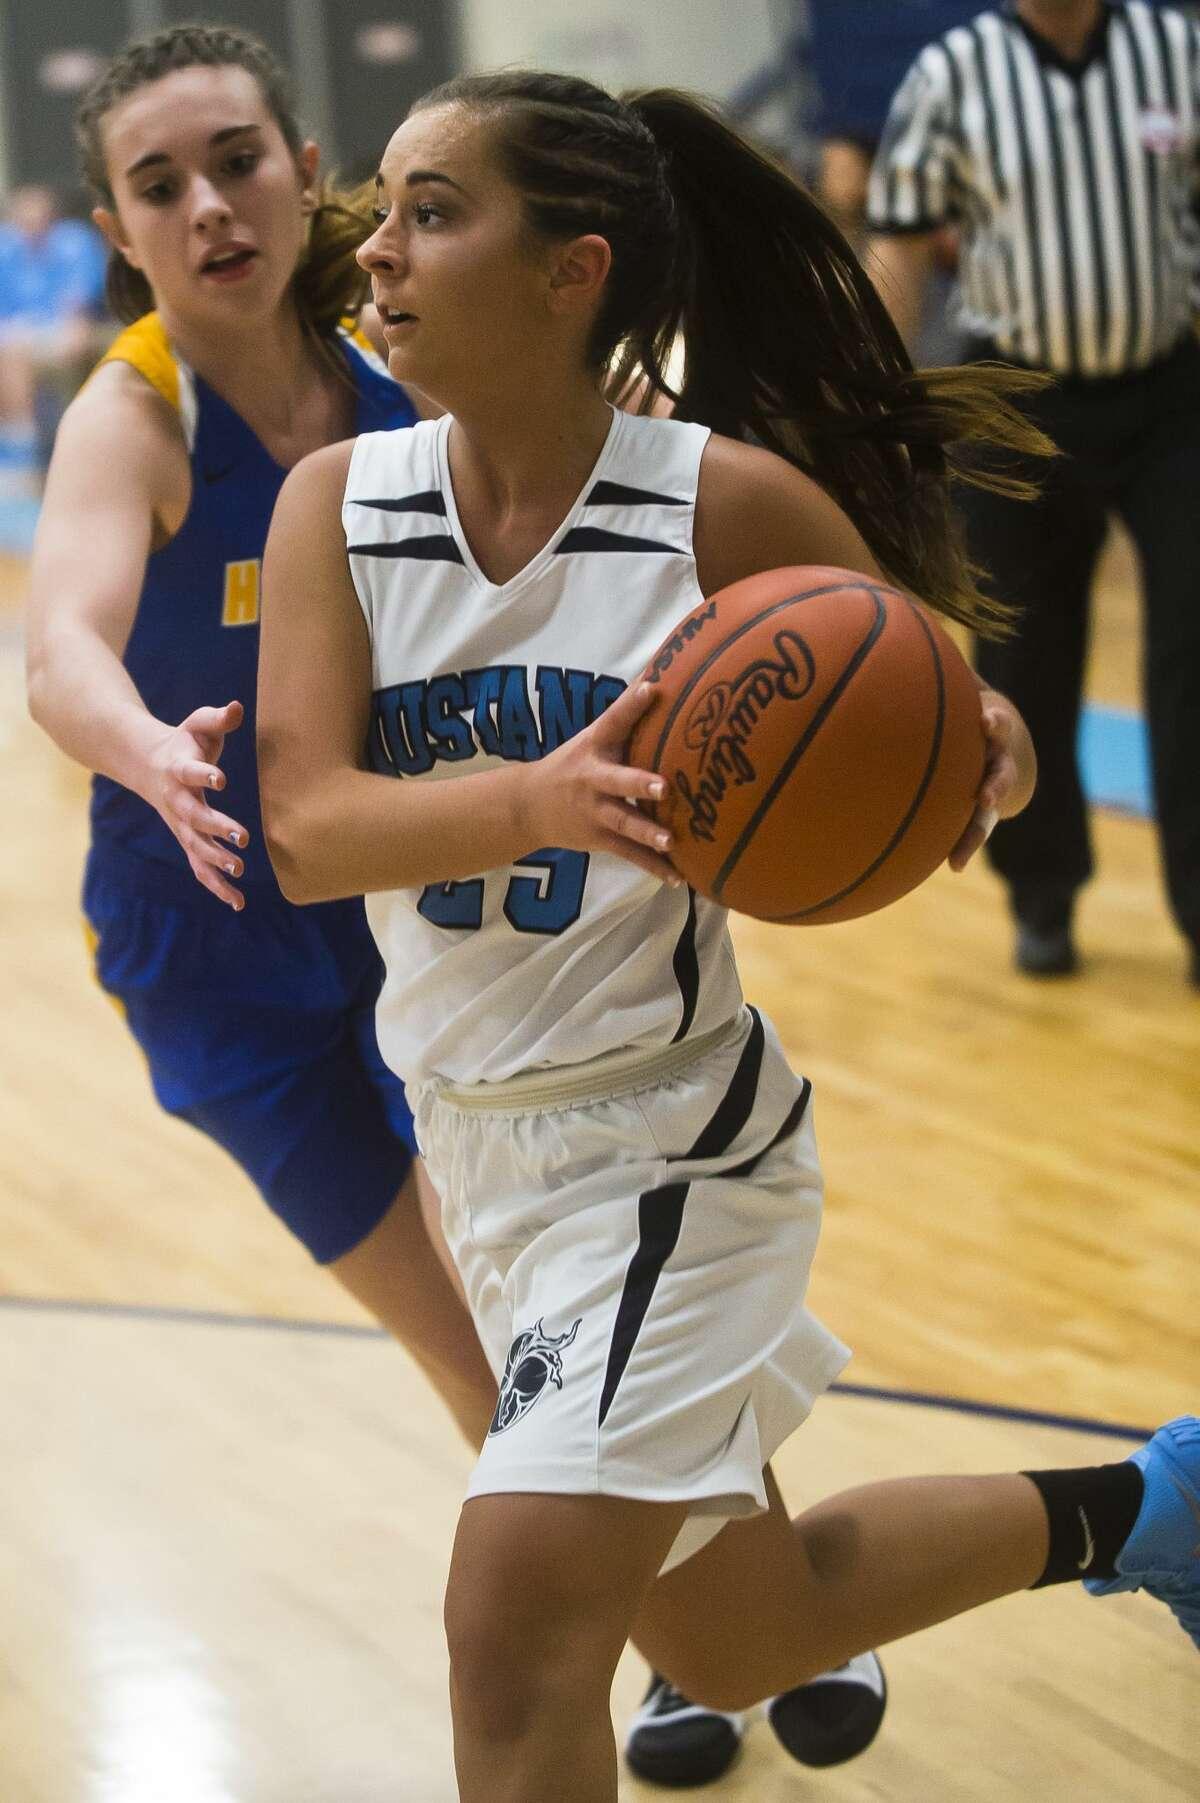 Meridian senior Holly Lavely dribbles toward the basket during the Mustangs' game against Harrison on Thursday, Feb. 22, 2018 at Meridian High School. (Katy Kildee/kkildee@mdn.net)